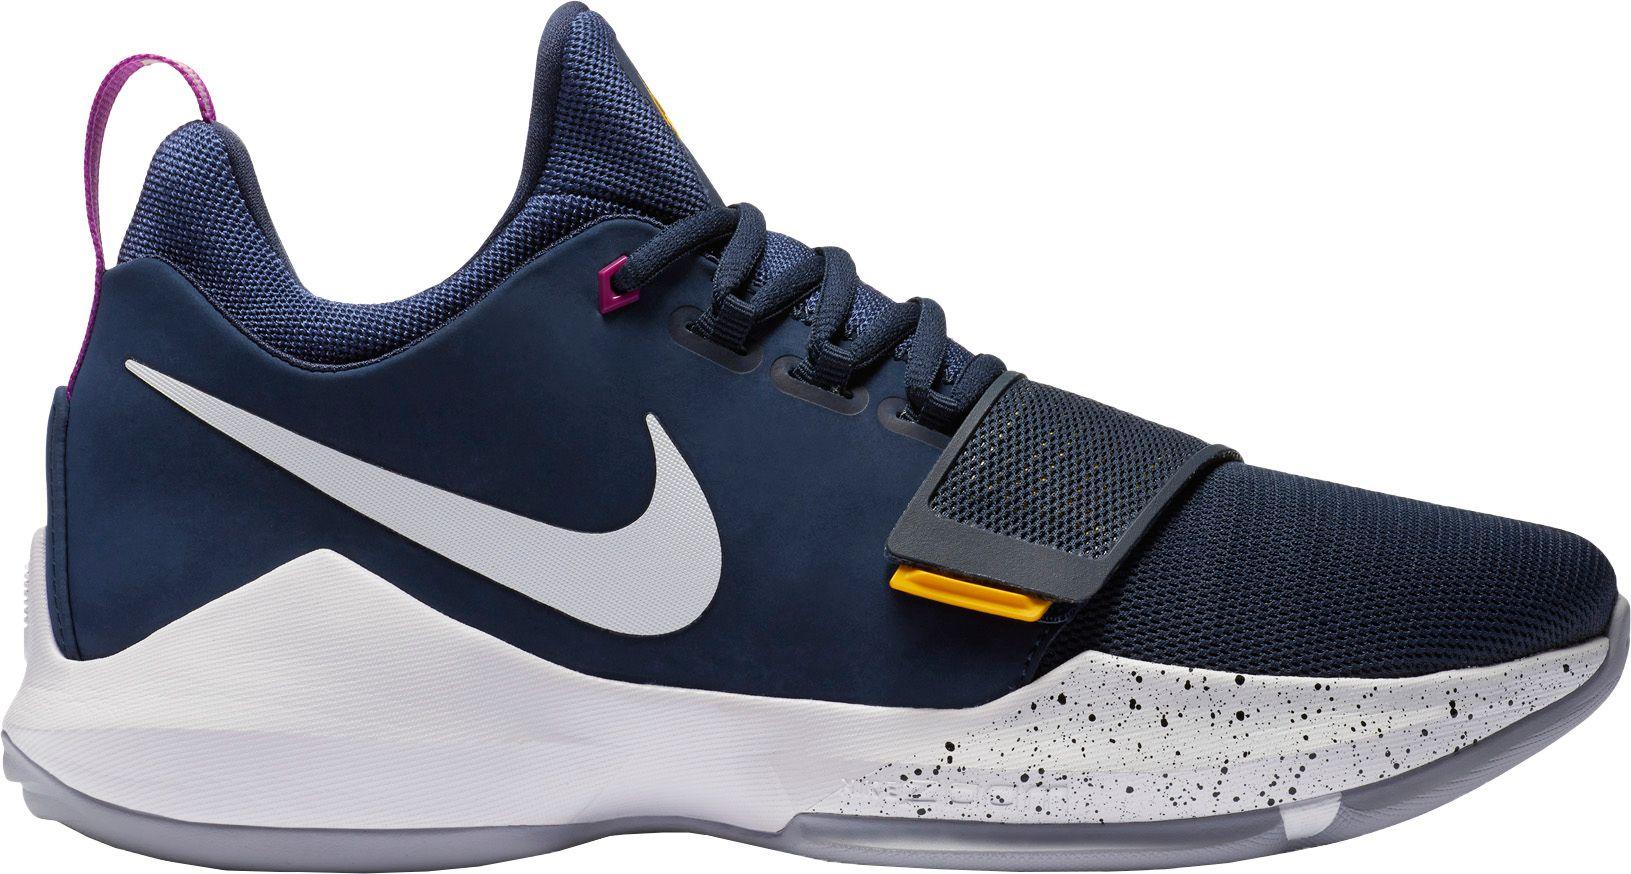 new style 5ce38 b573d pg1 mens basketball shoe  noimagefound